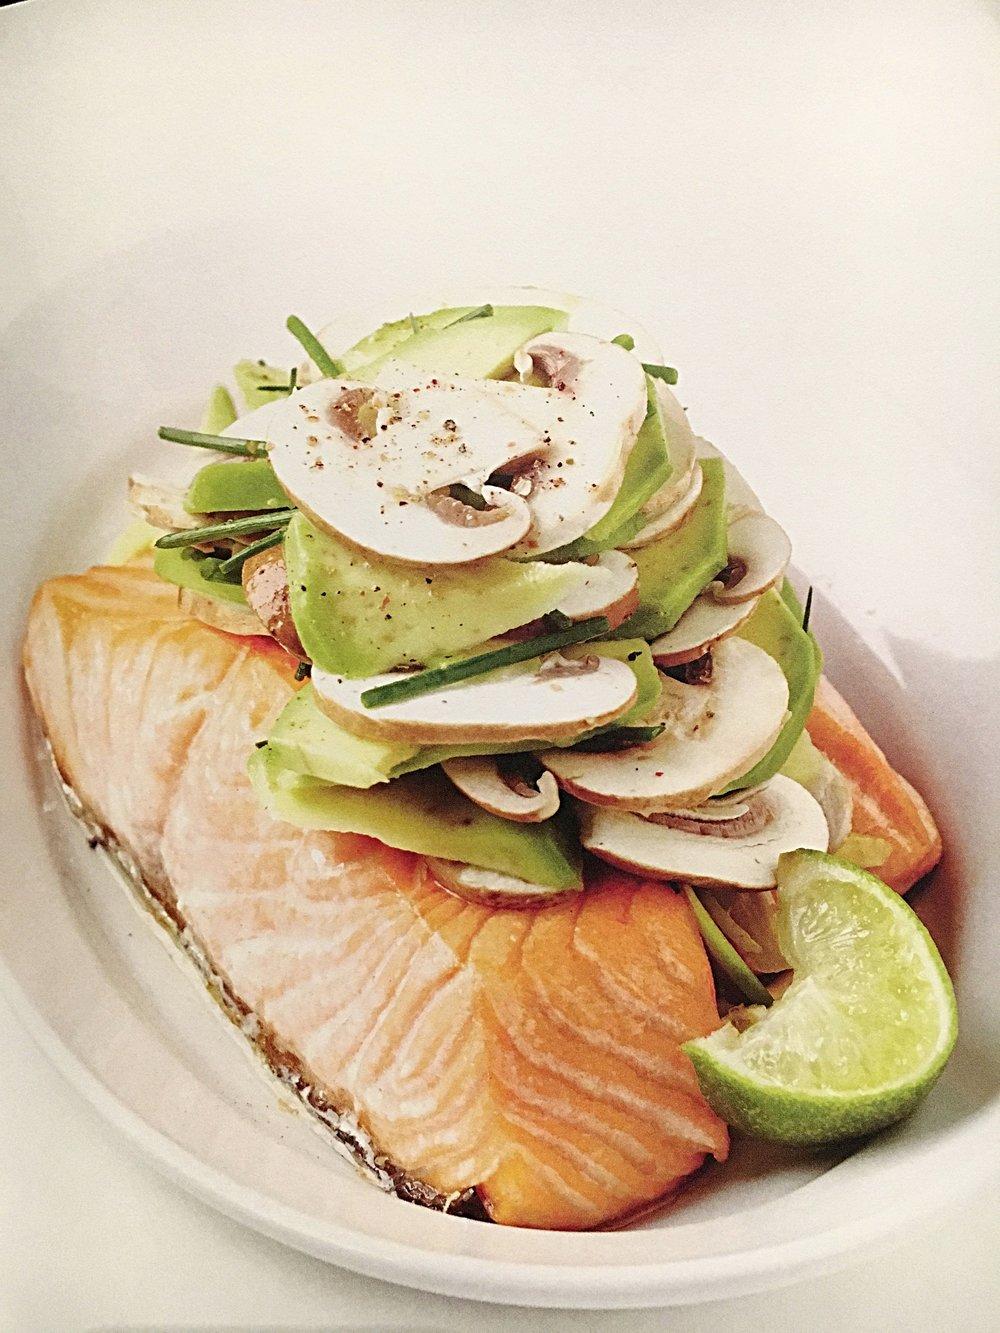 Salmon - Prep Time: 15 minsCook Time: 20 mins